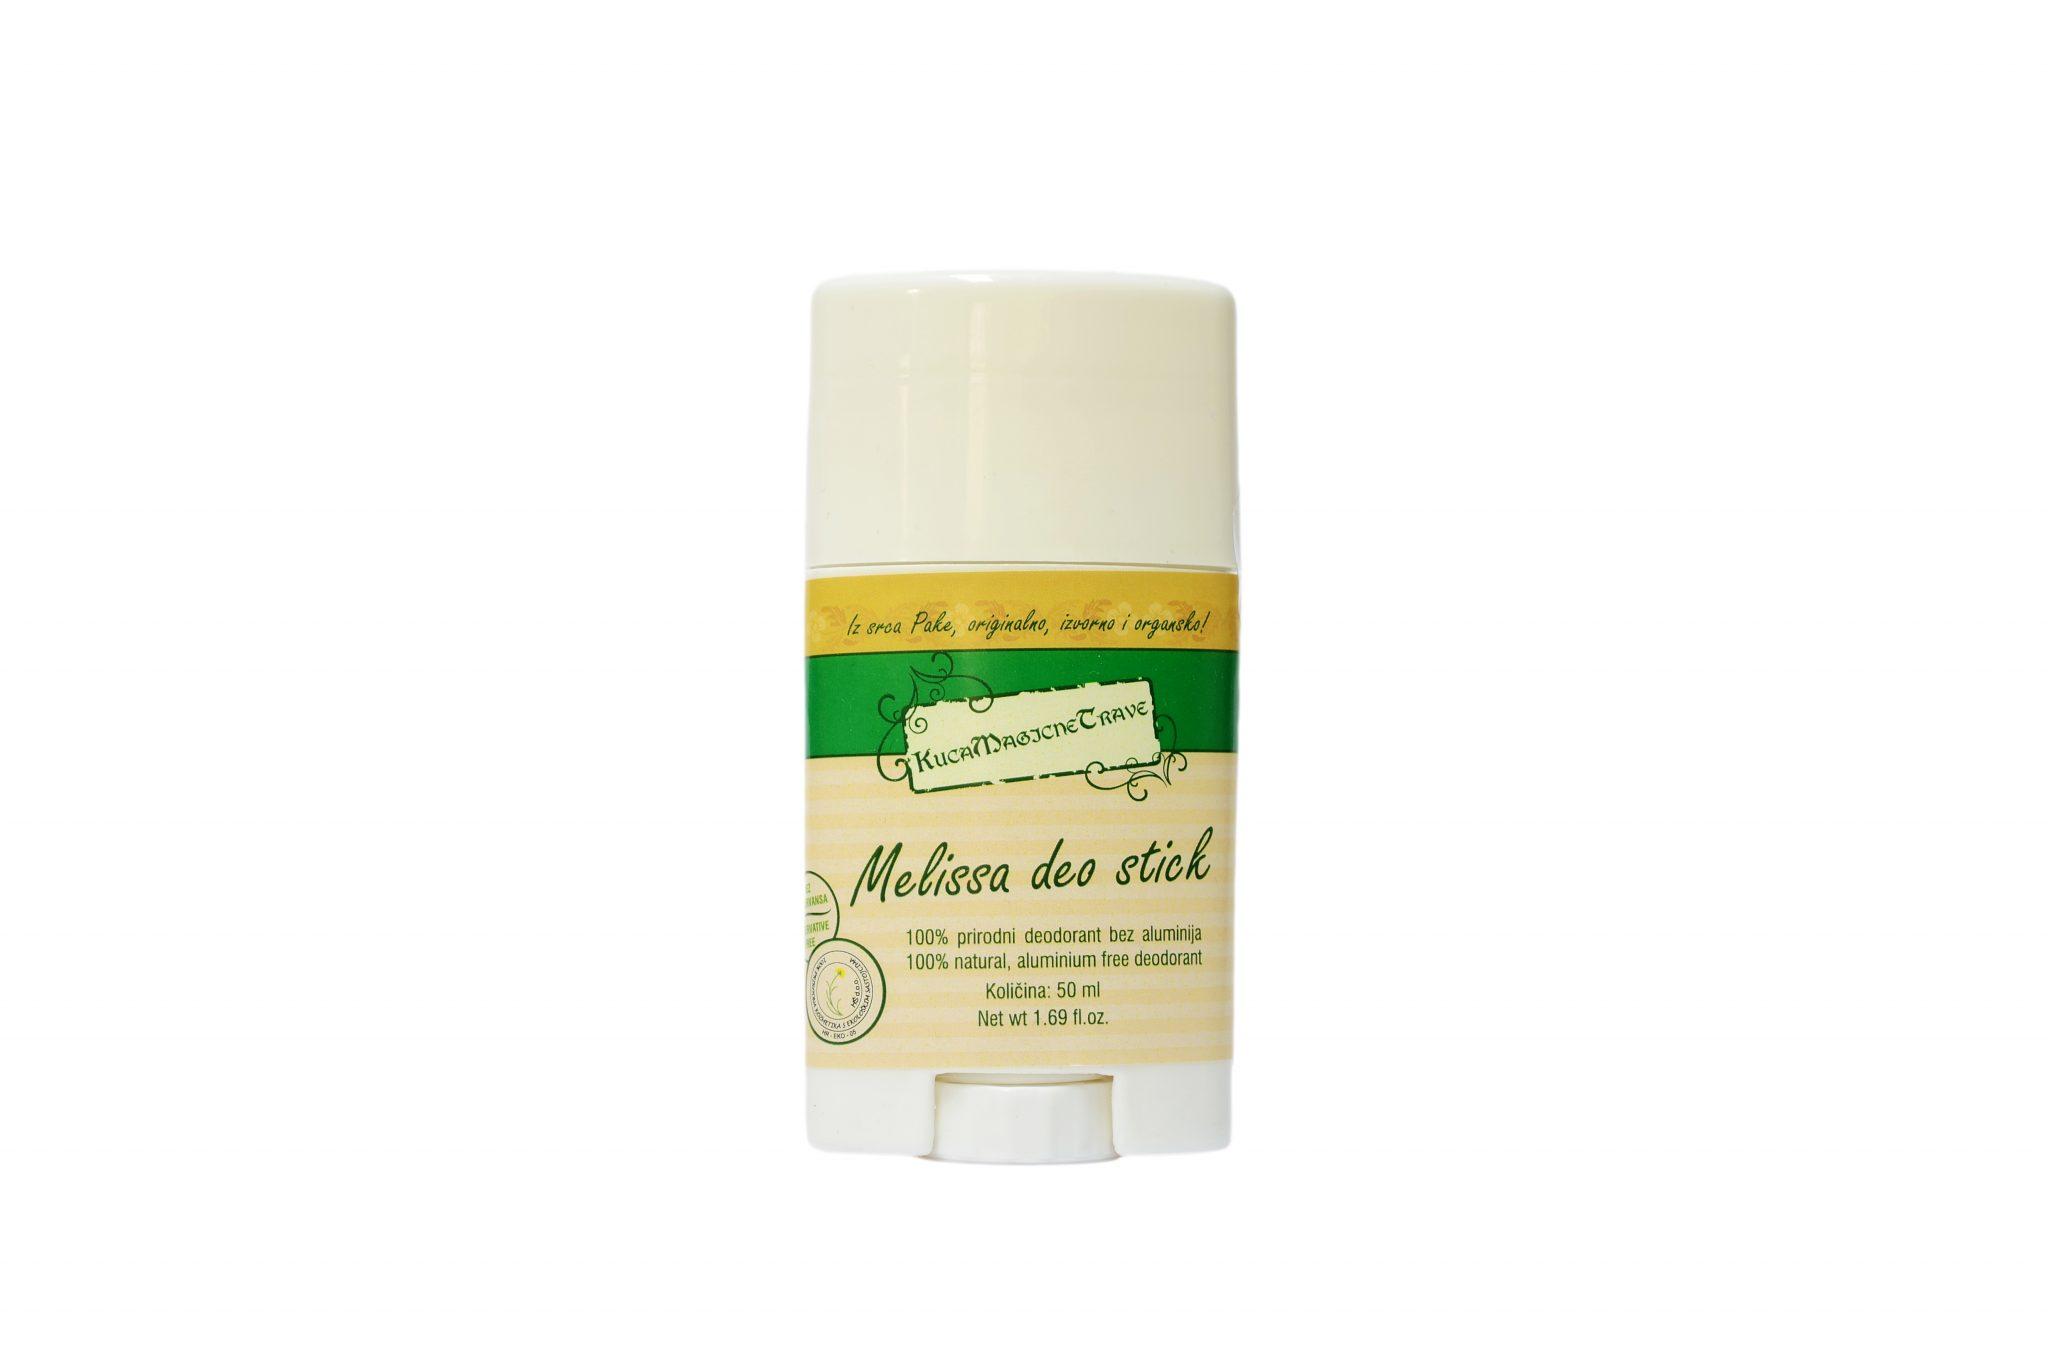 Melissa natural deodorant/ Prirodni deodorant melisa